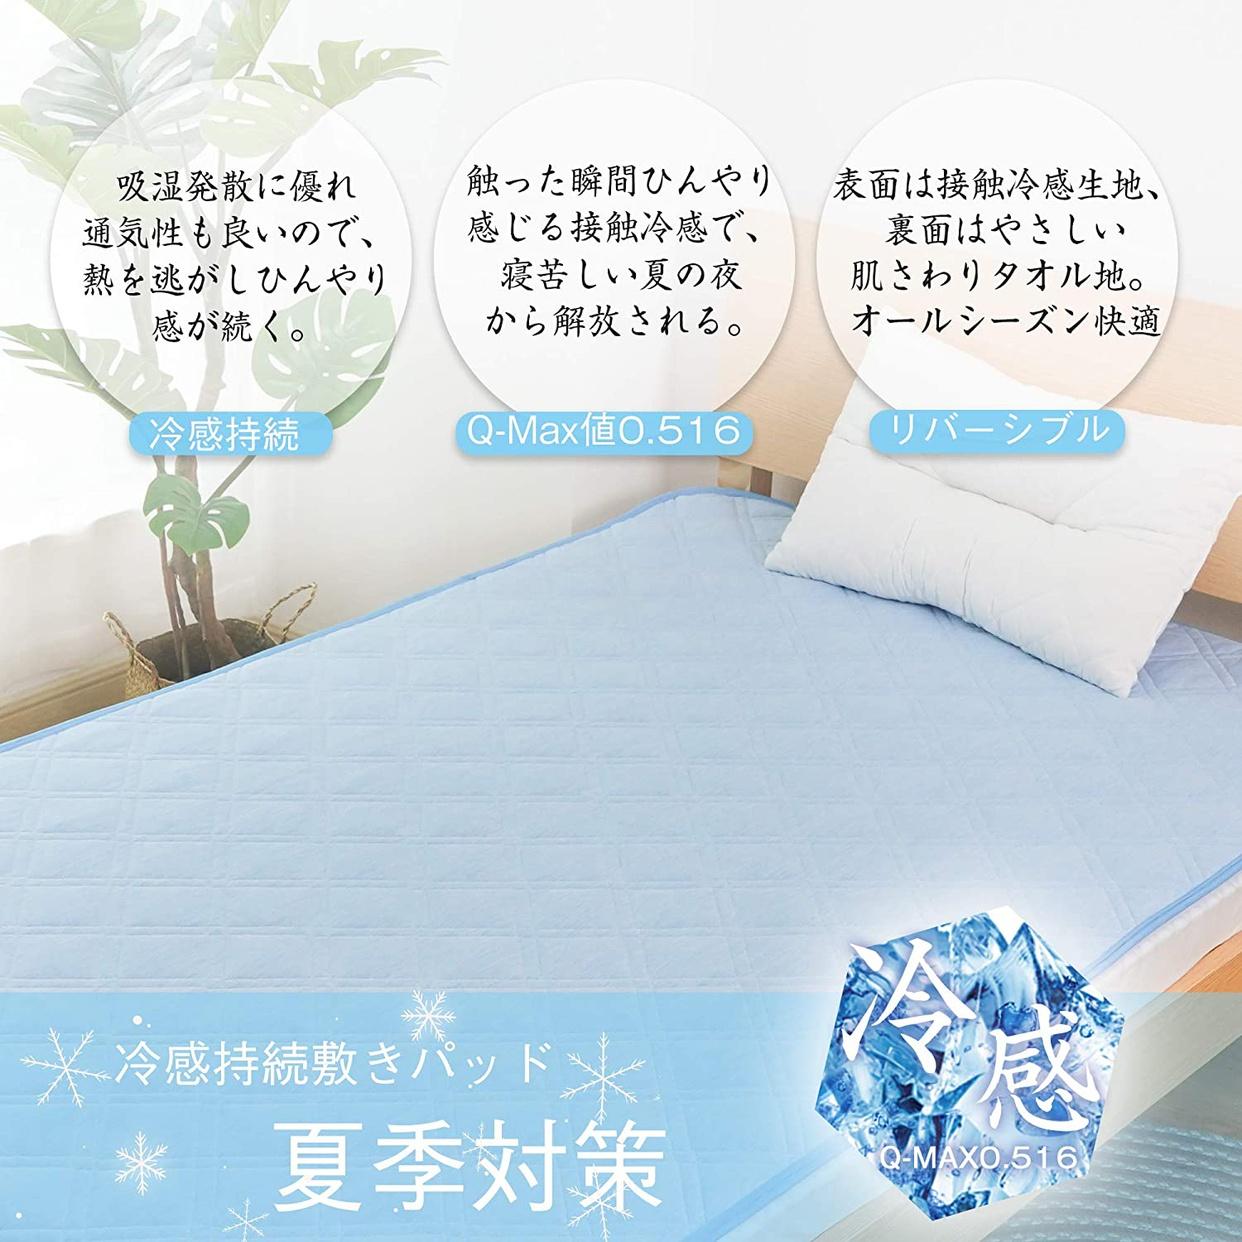 mensu(メンス) ひんやり 敷きパッドの商品画像3